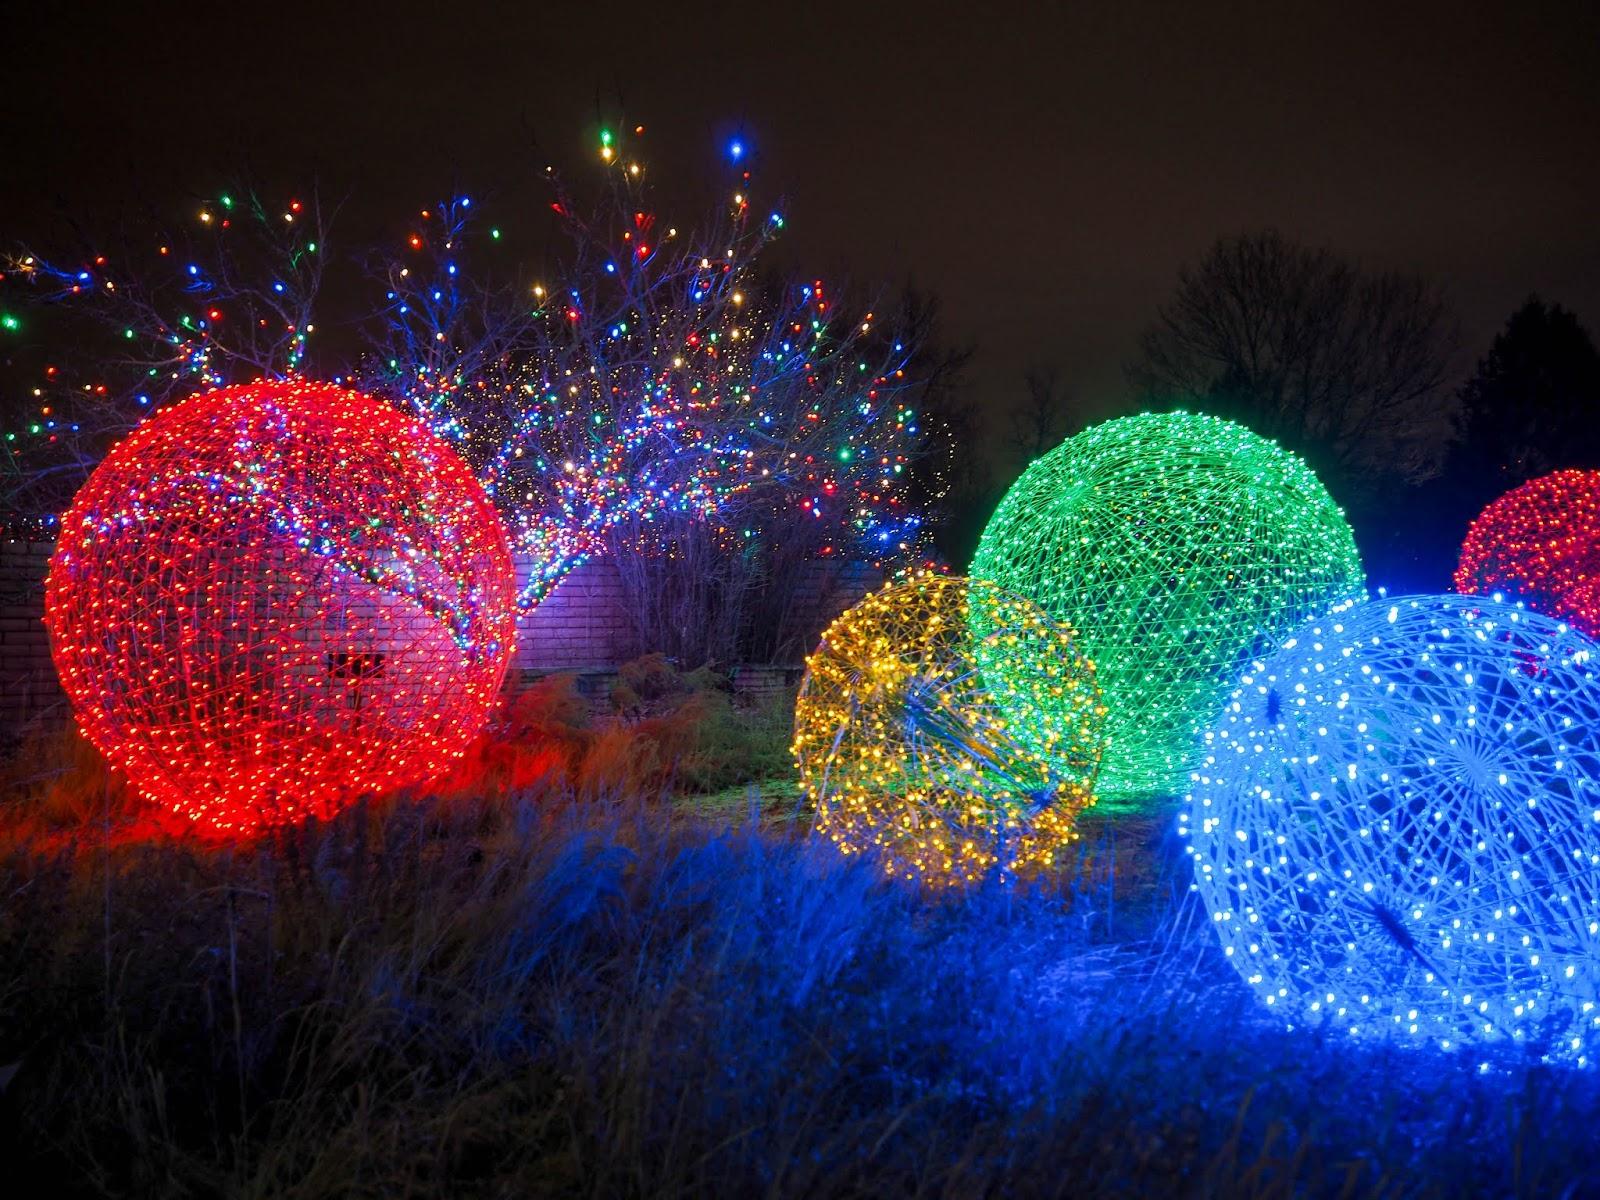 PC263646 - Blossoms Of Light Denver Botanic Gardens December 10